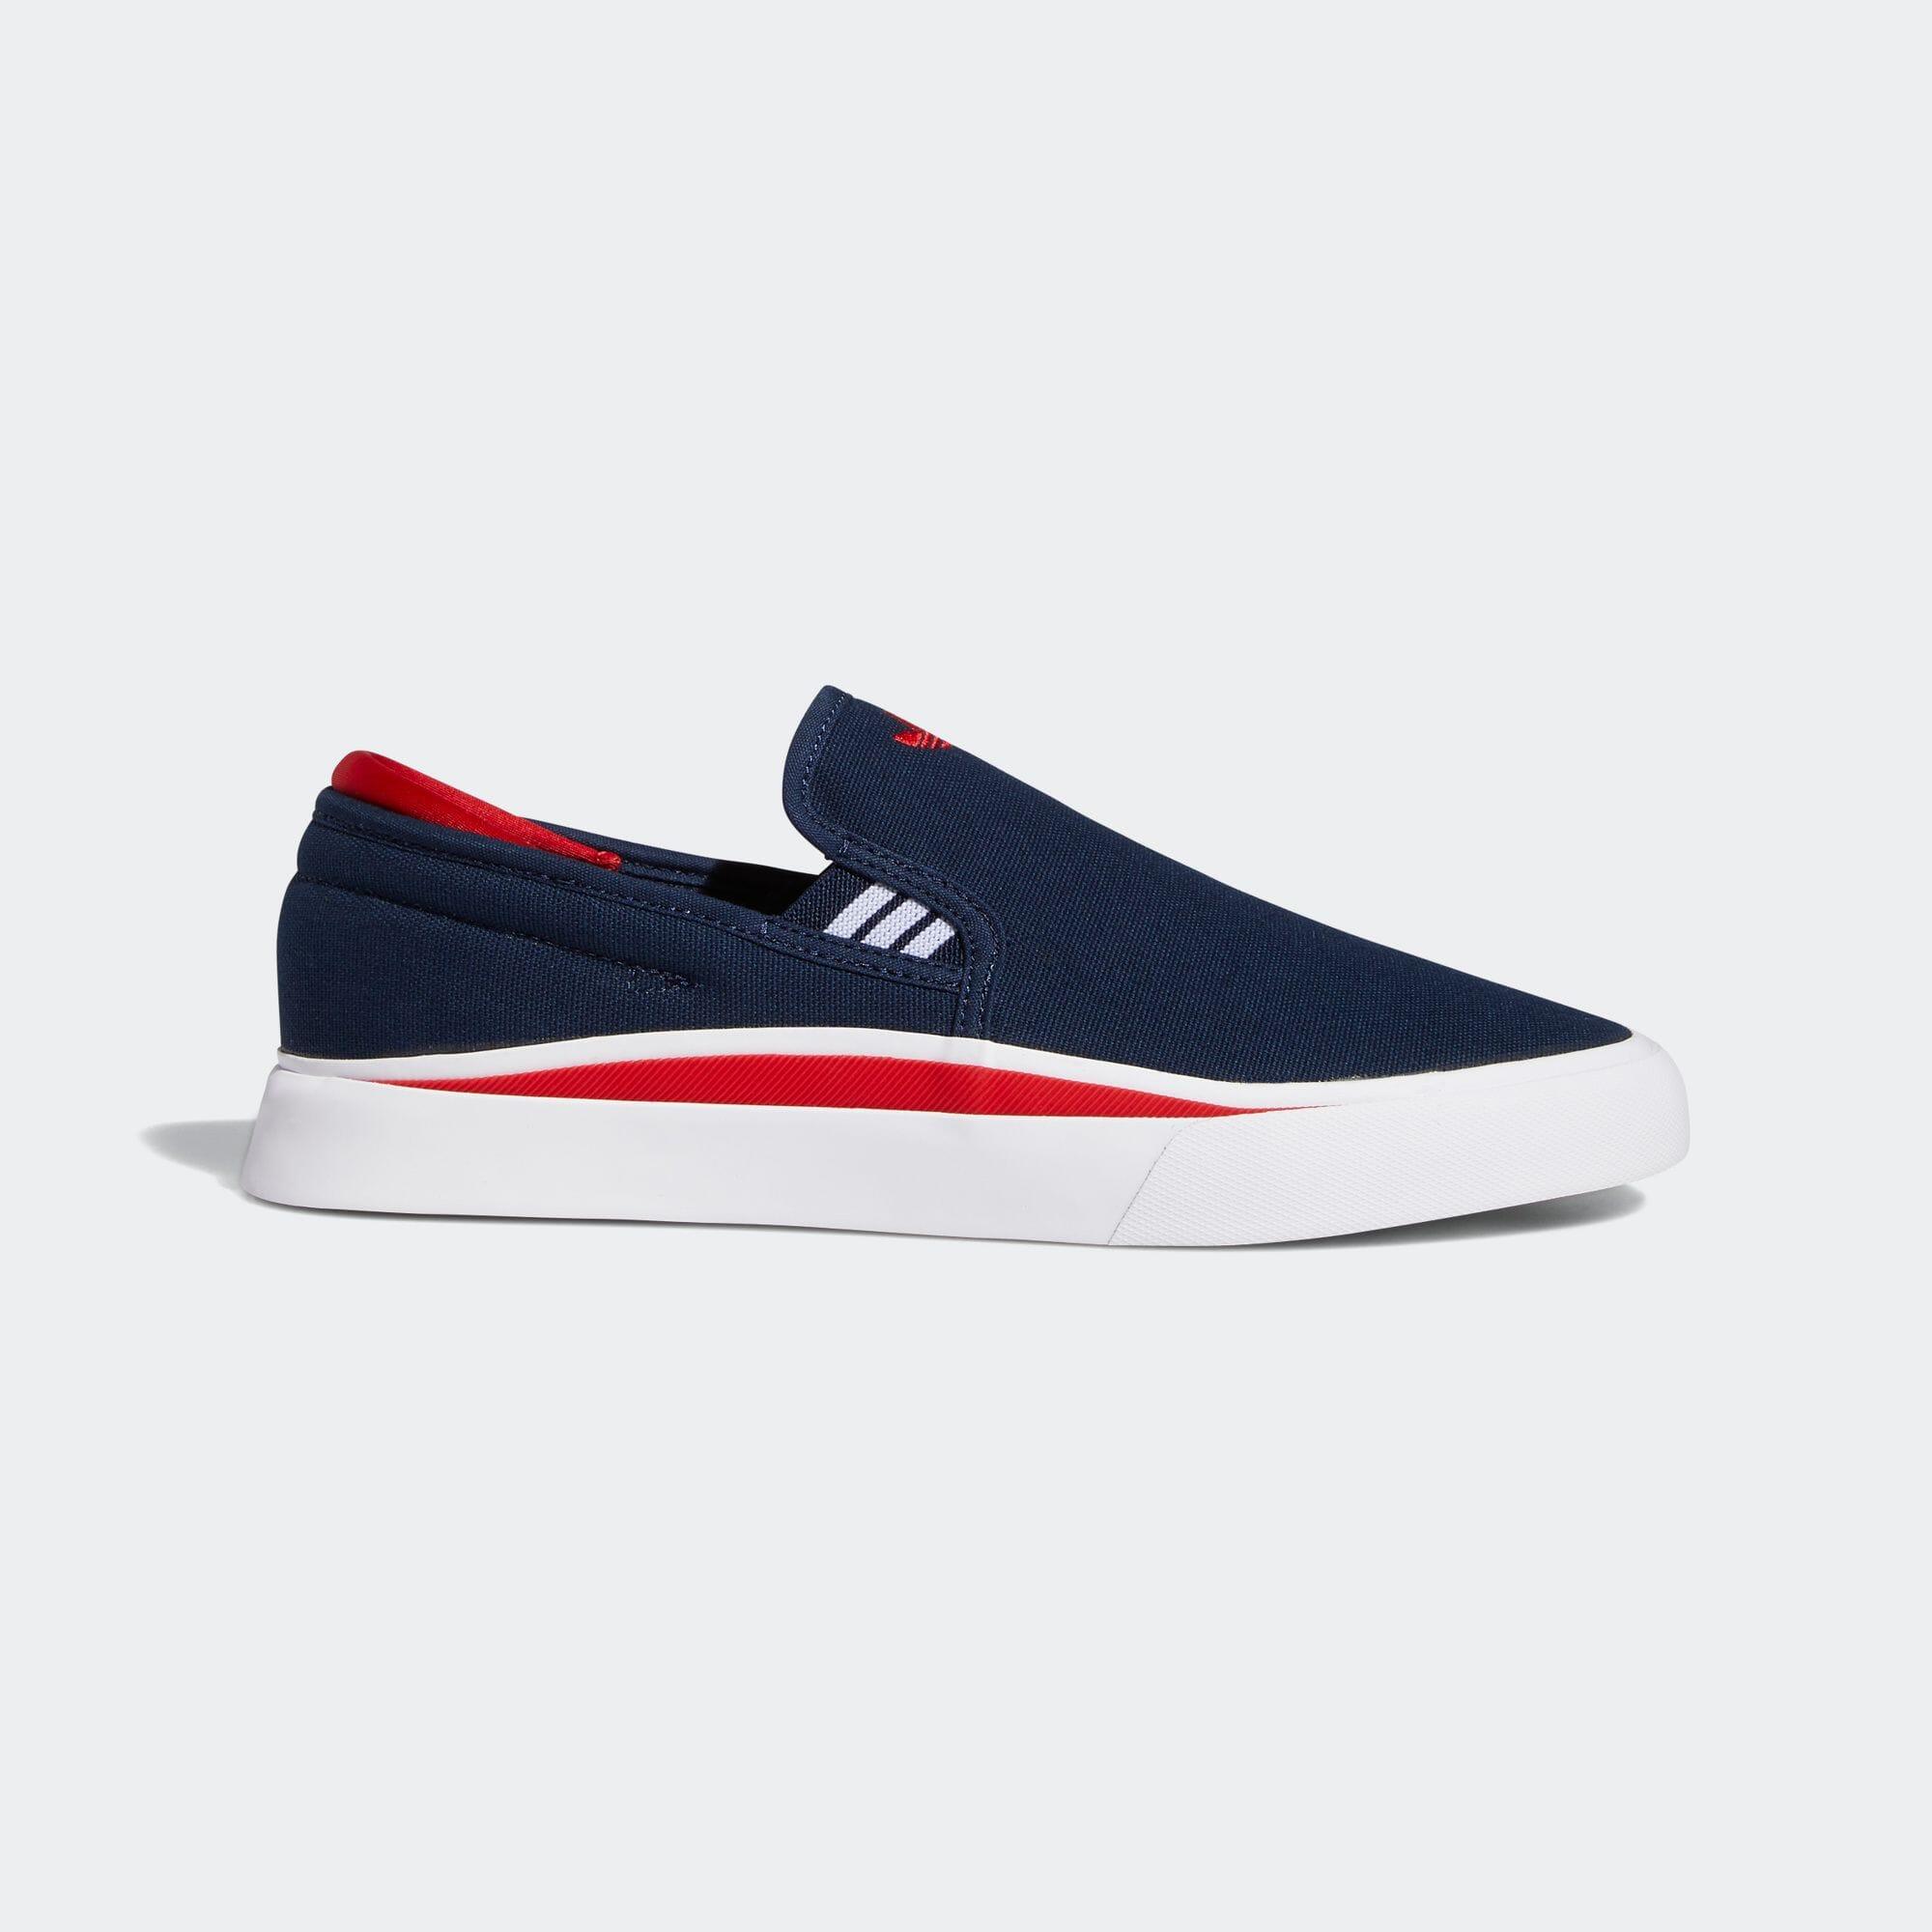 https://shop.adidas.jp/products/FV0699/